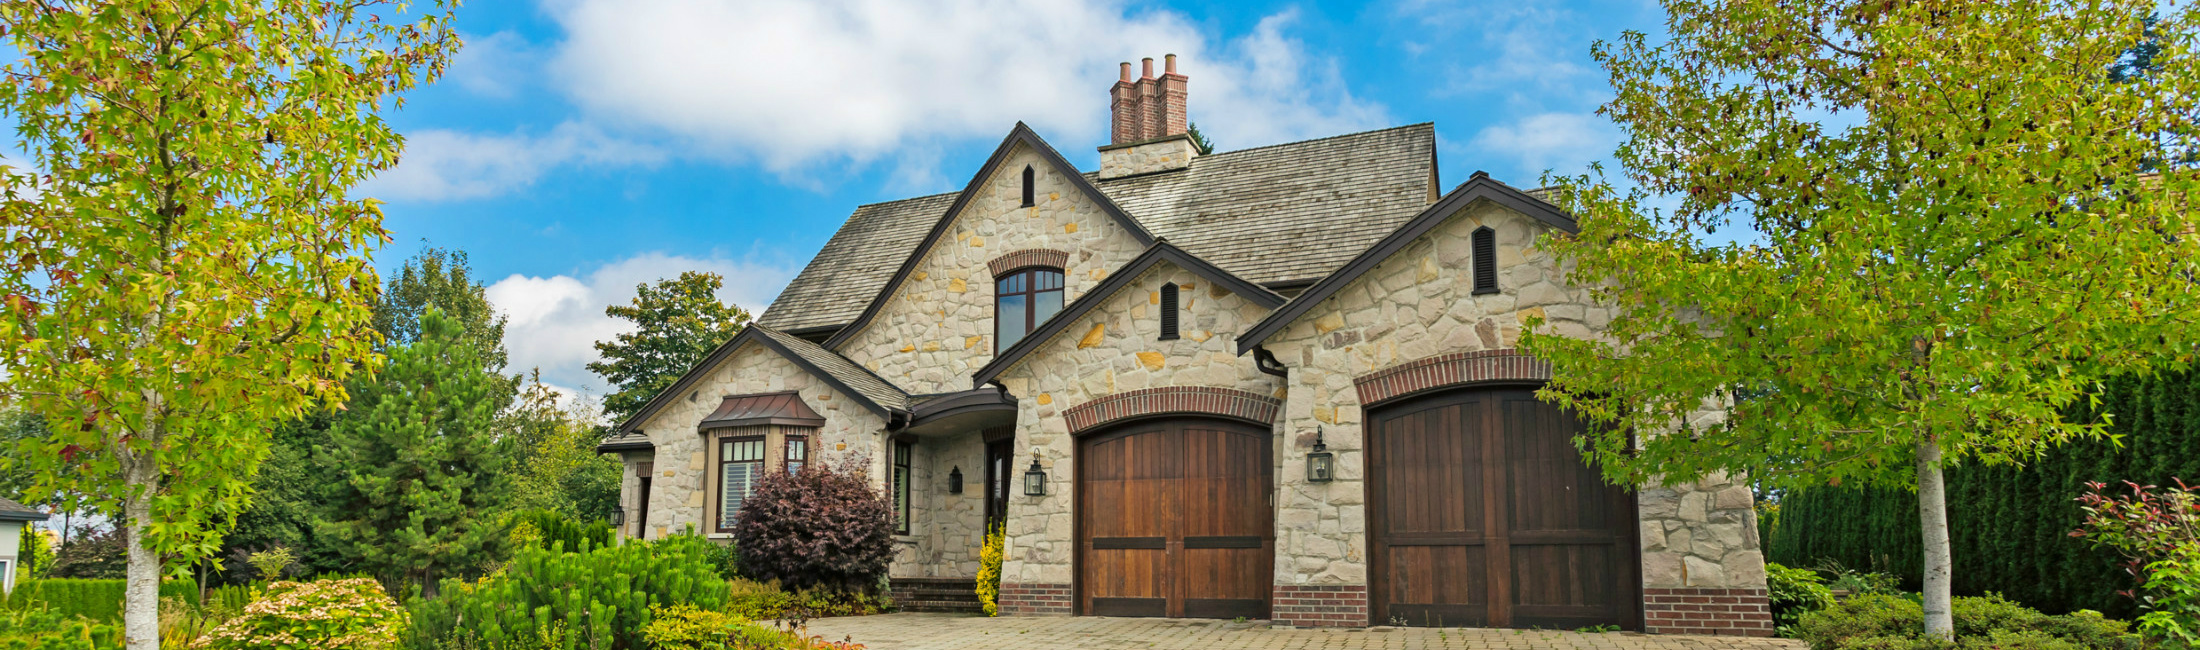 Garden Ridge Homes For Sale San Antonio Real Estate